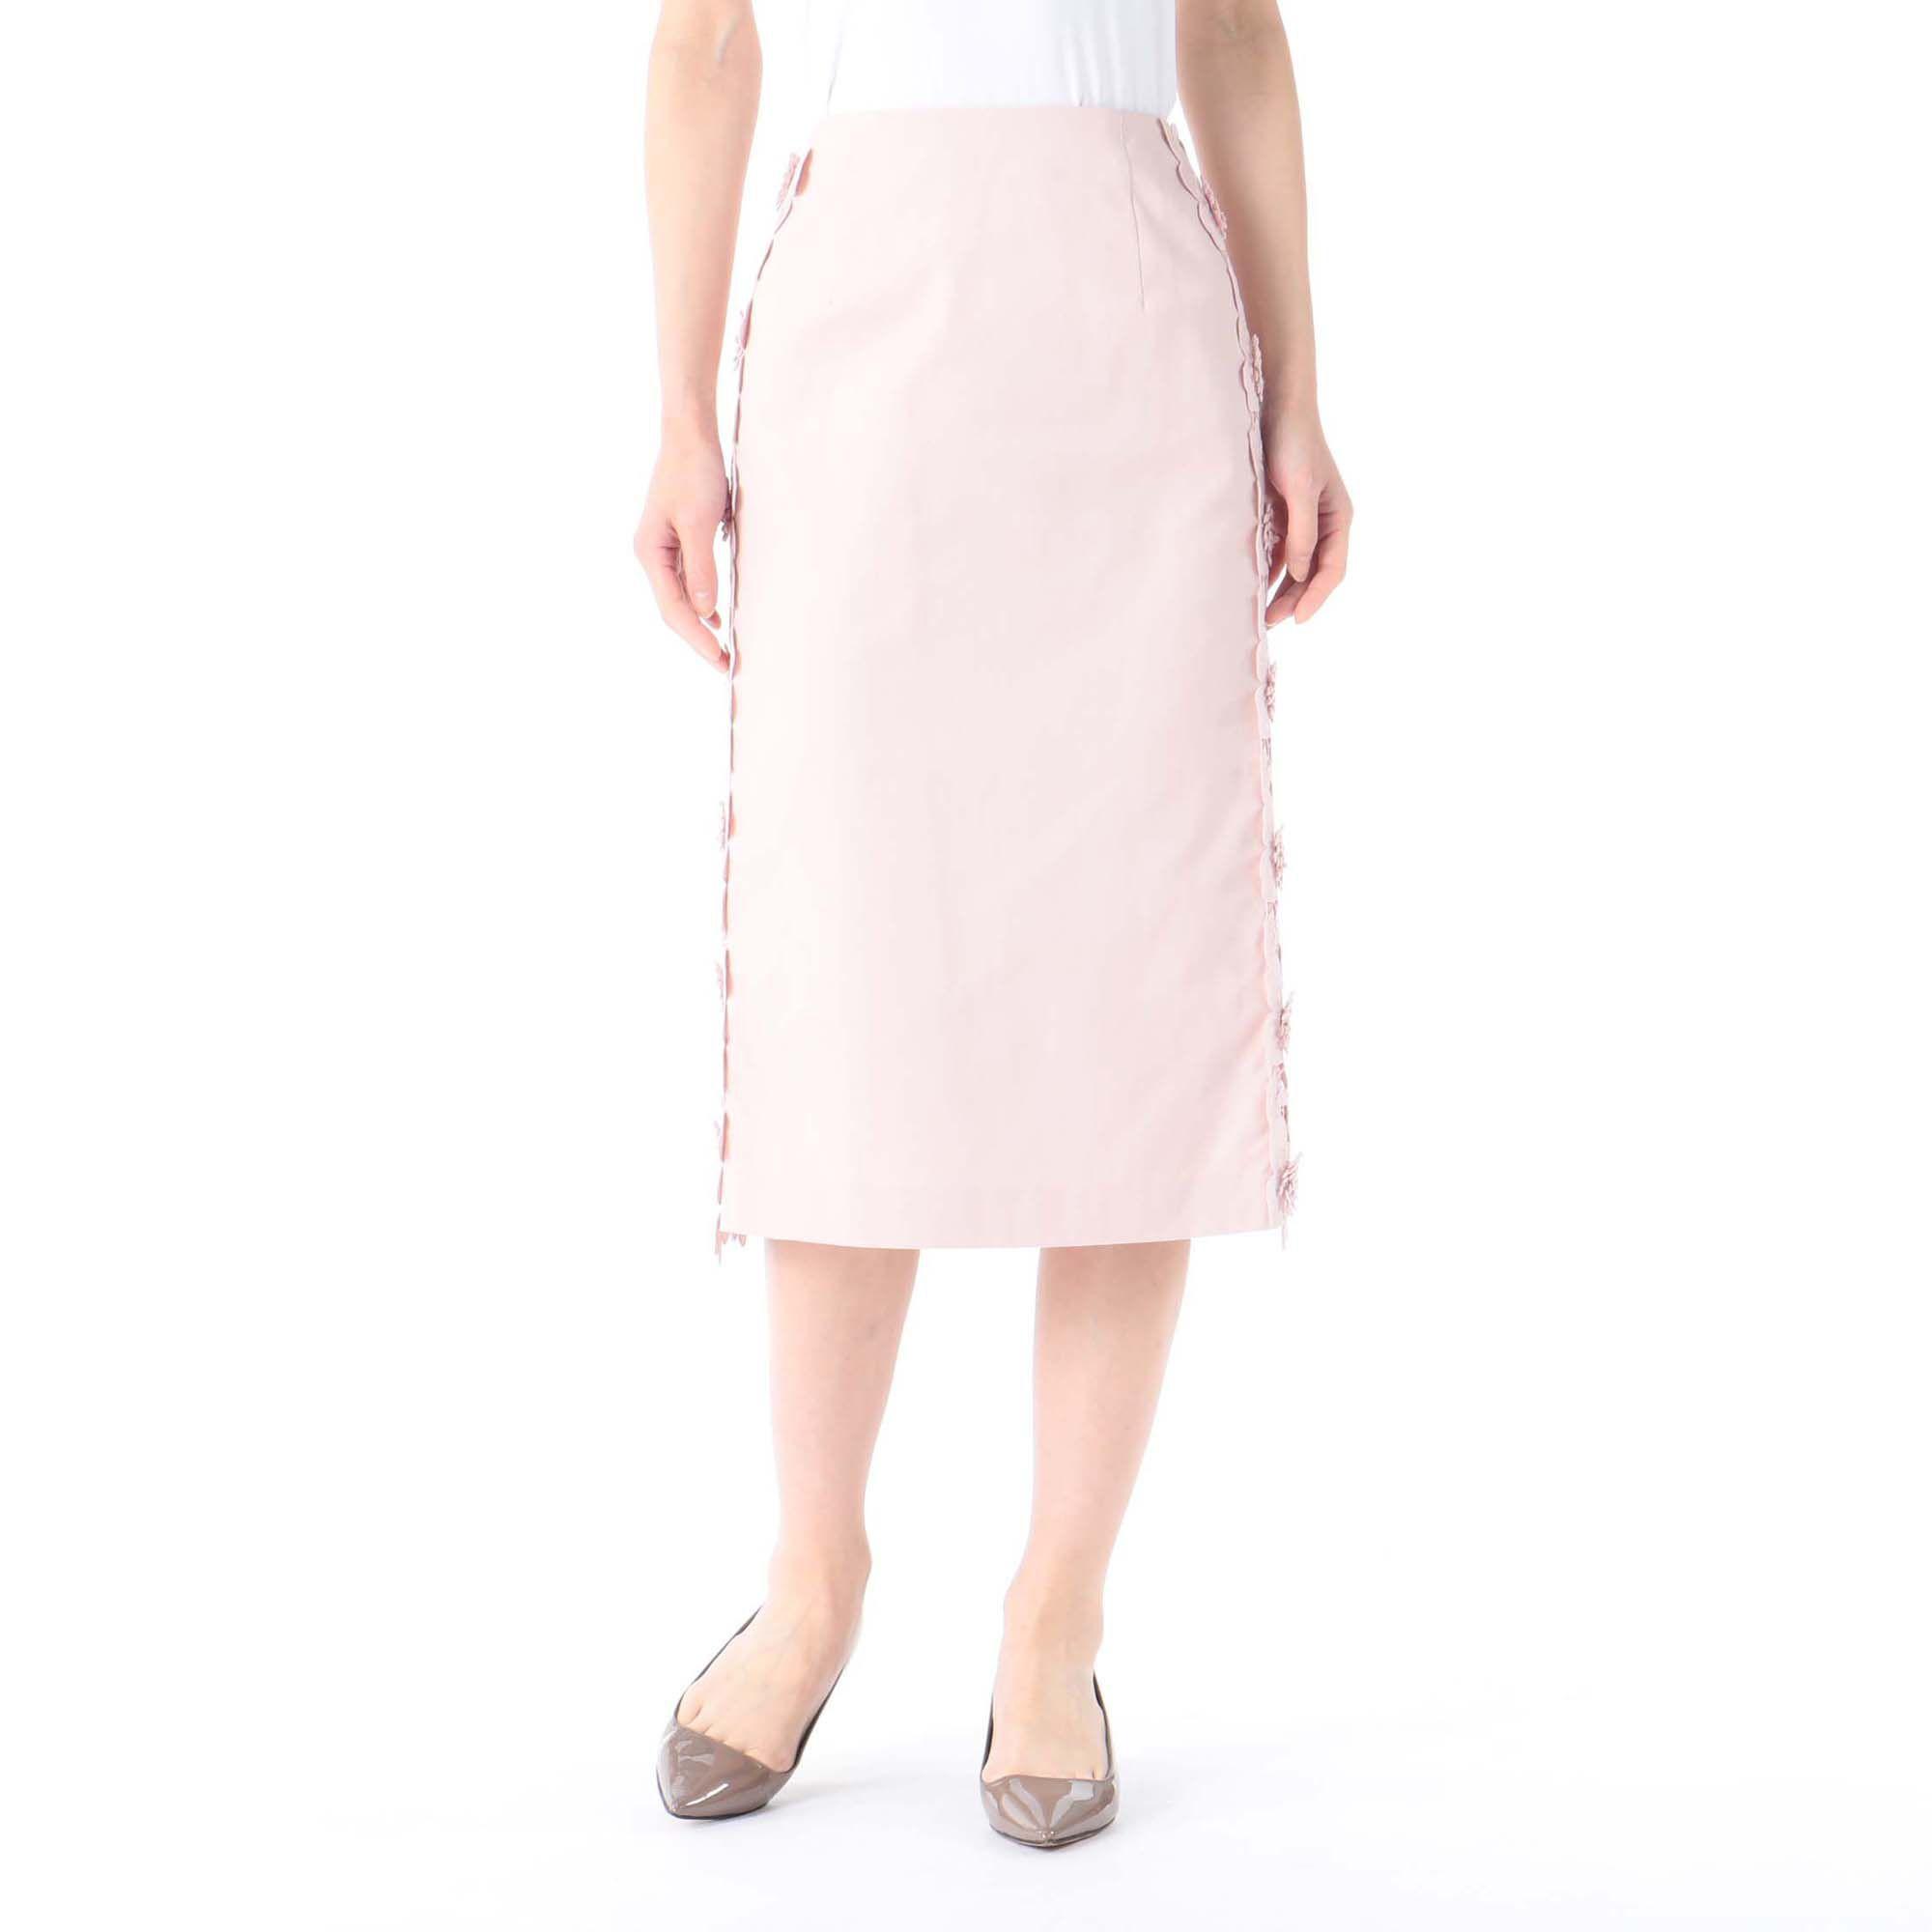 PARIGOTパリゴ/サイドレースタイトスカート